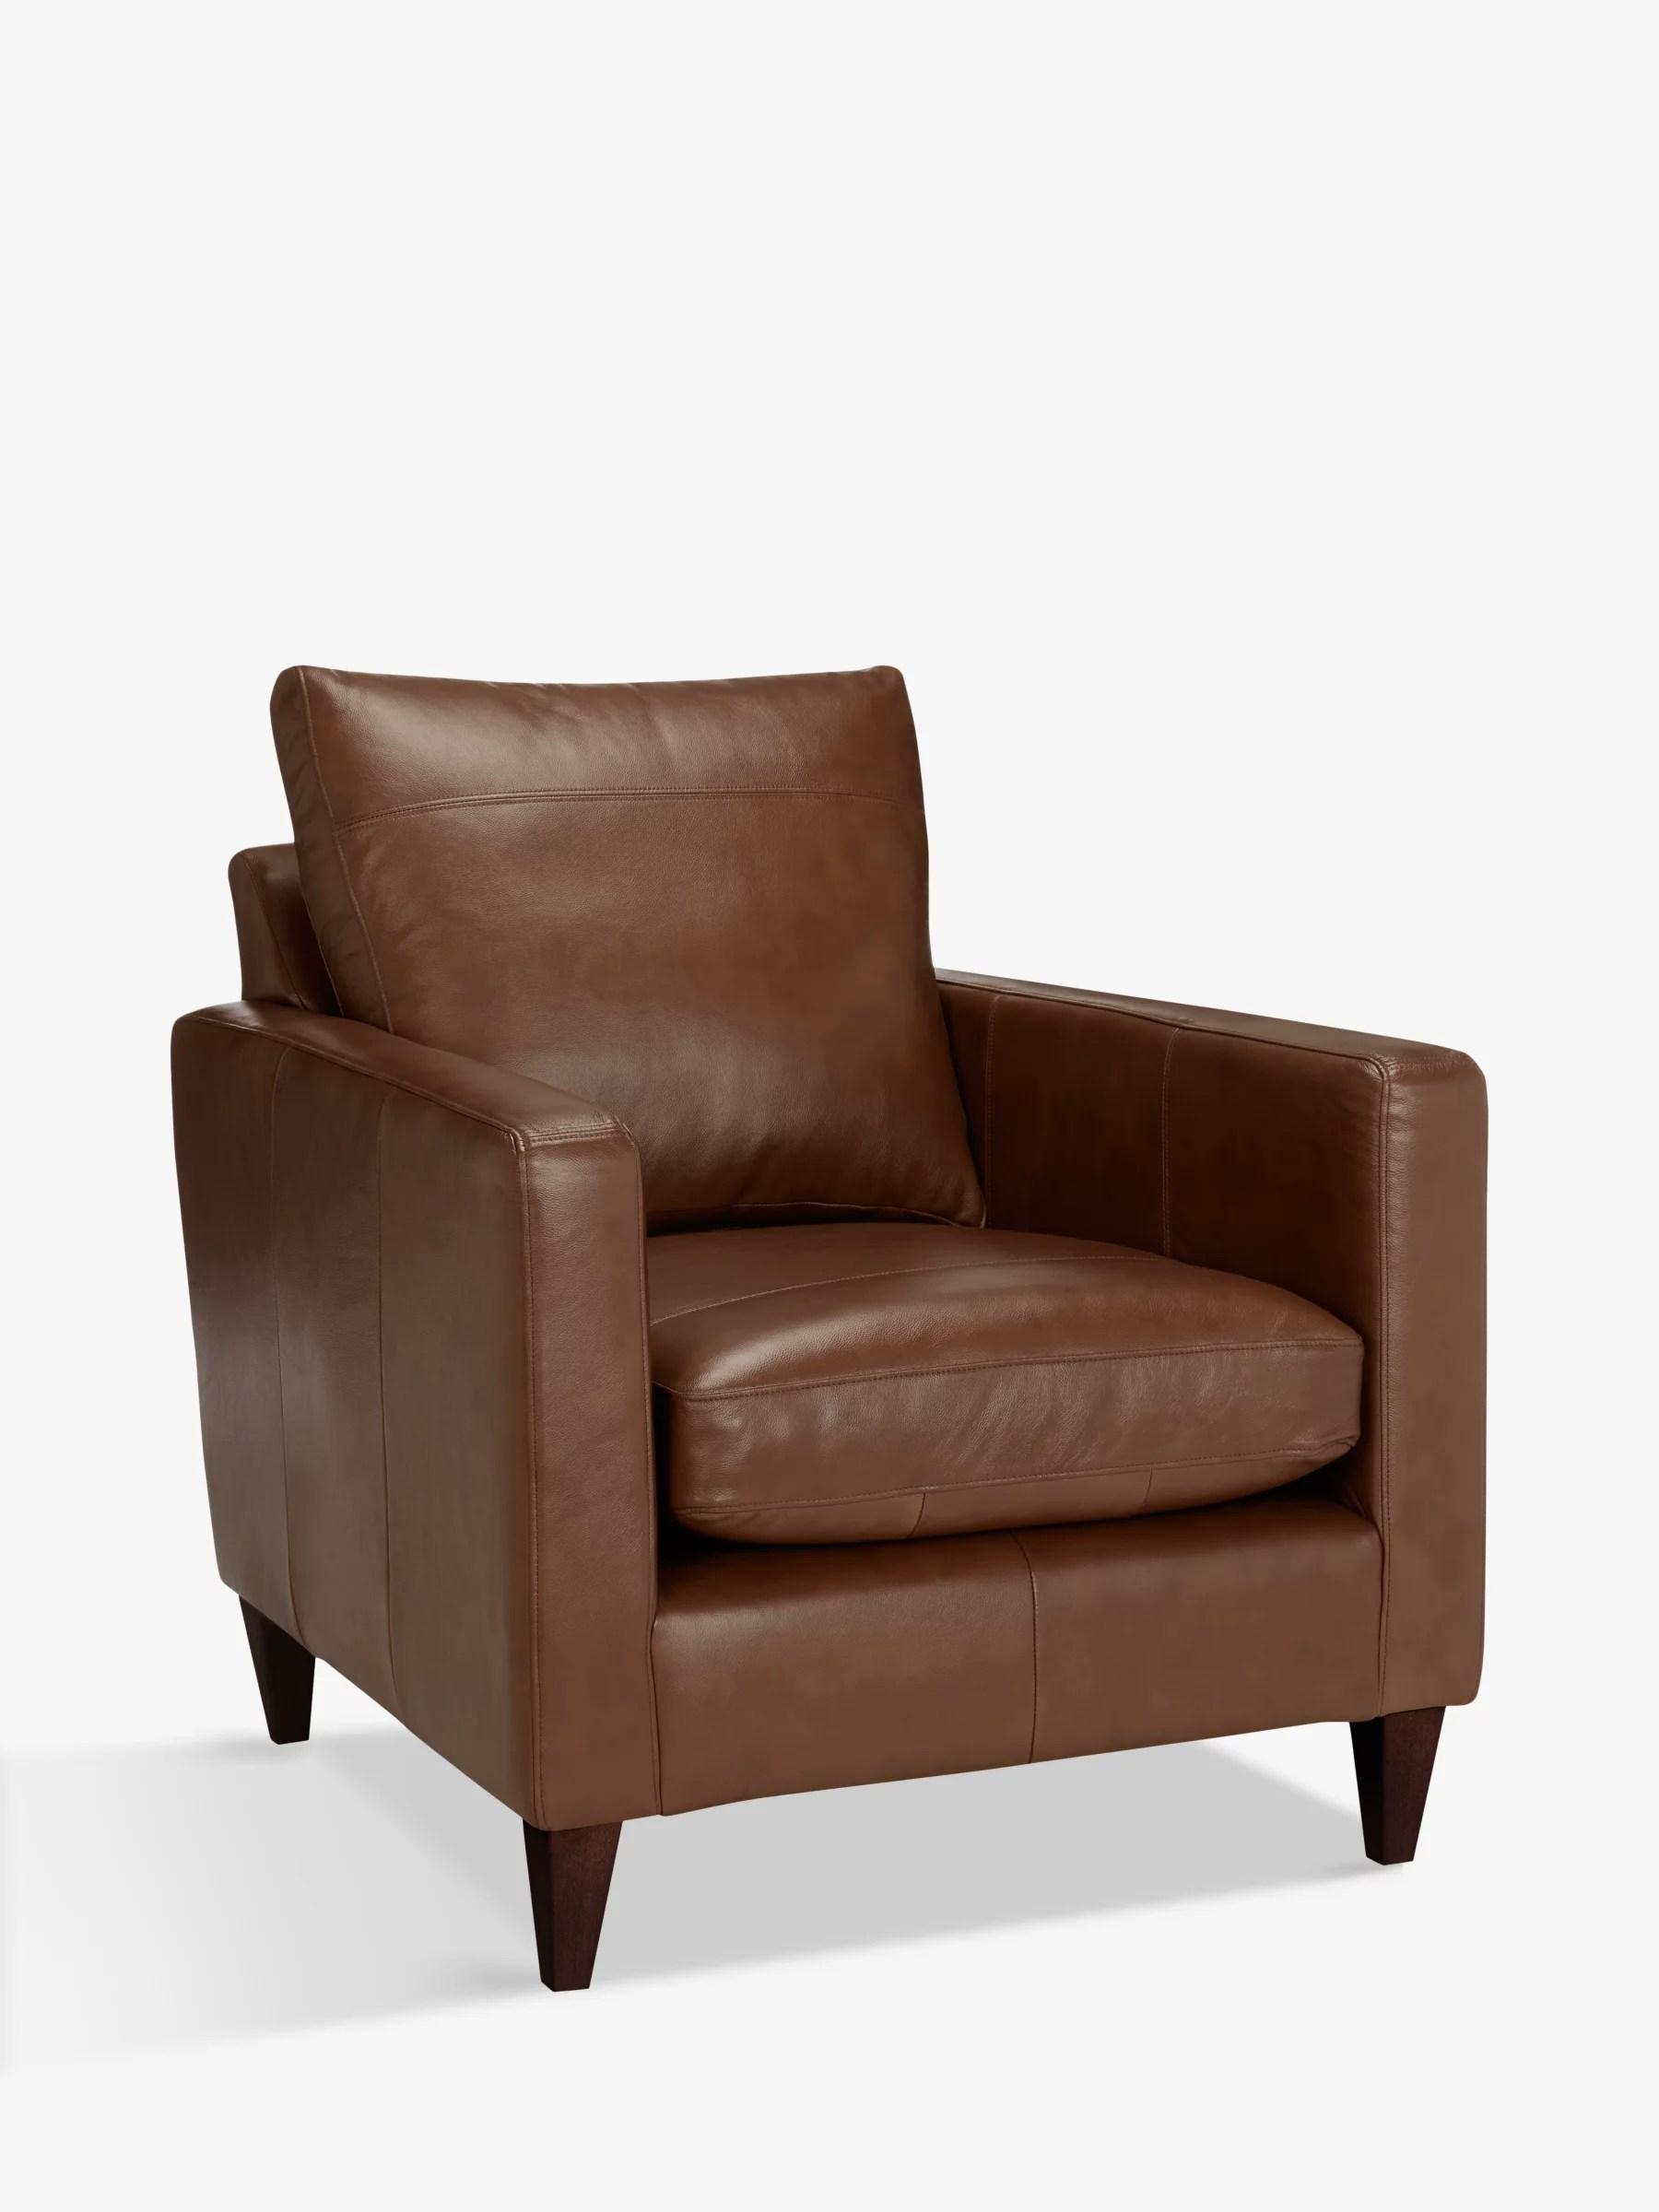 dark brown leather chair ikea black office armchairs furniture john lewis partners bailey armchair leg milan chestnut